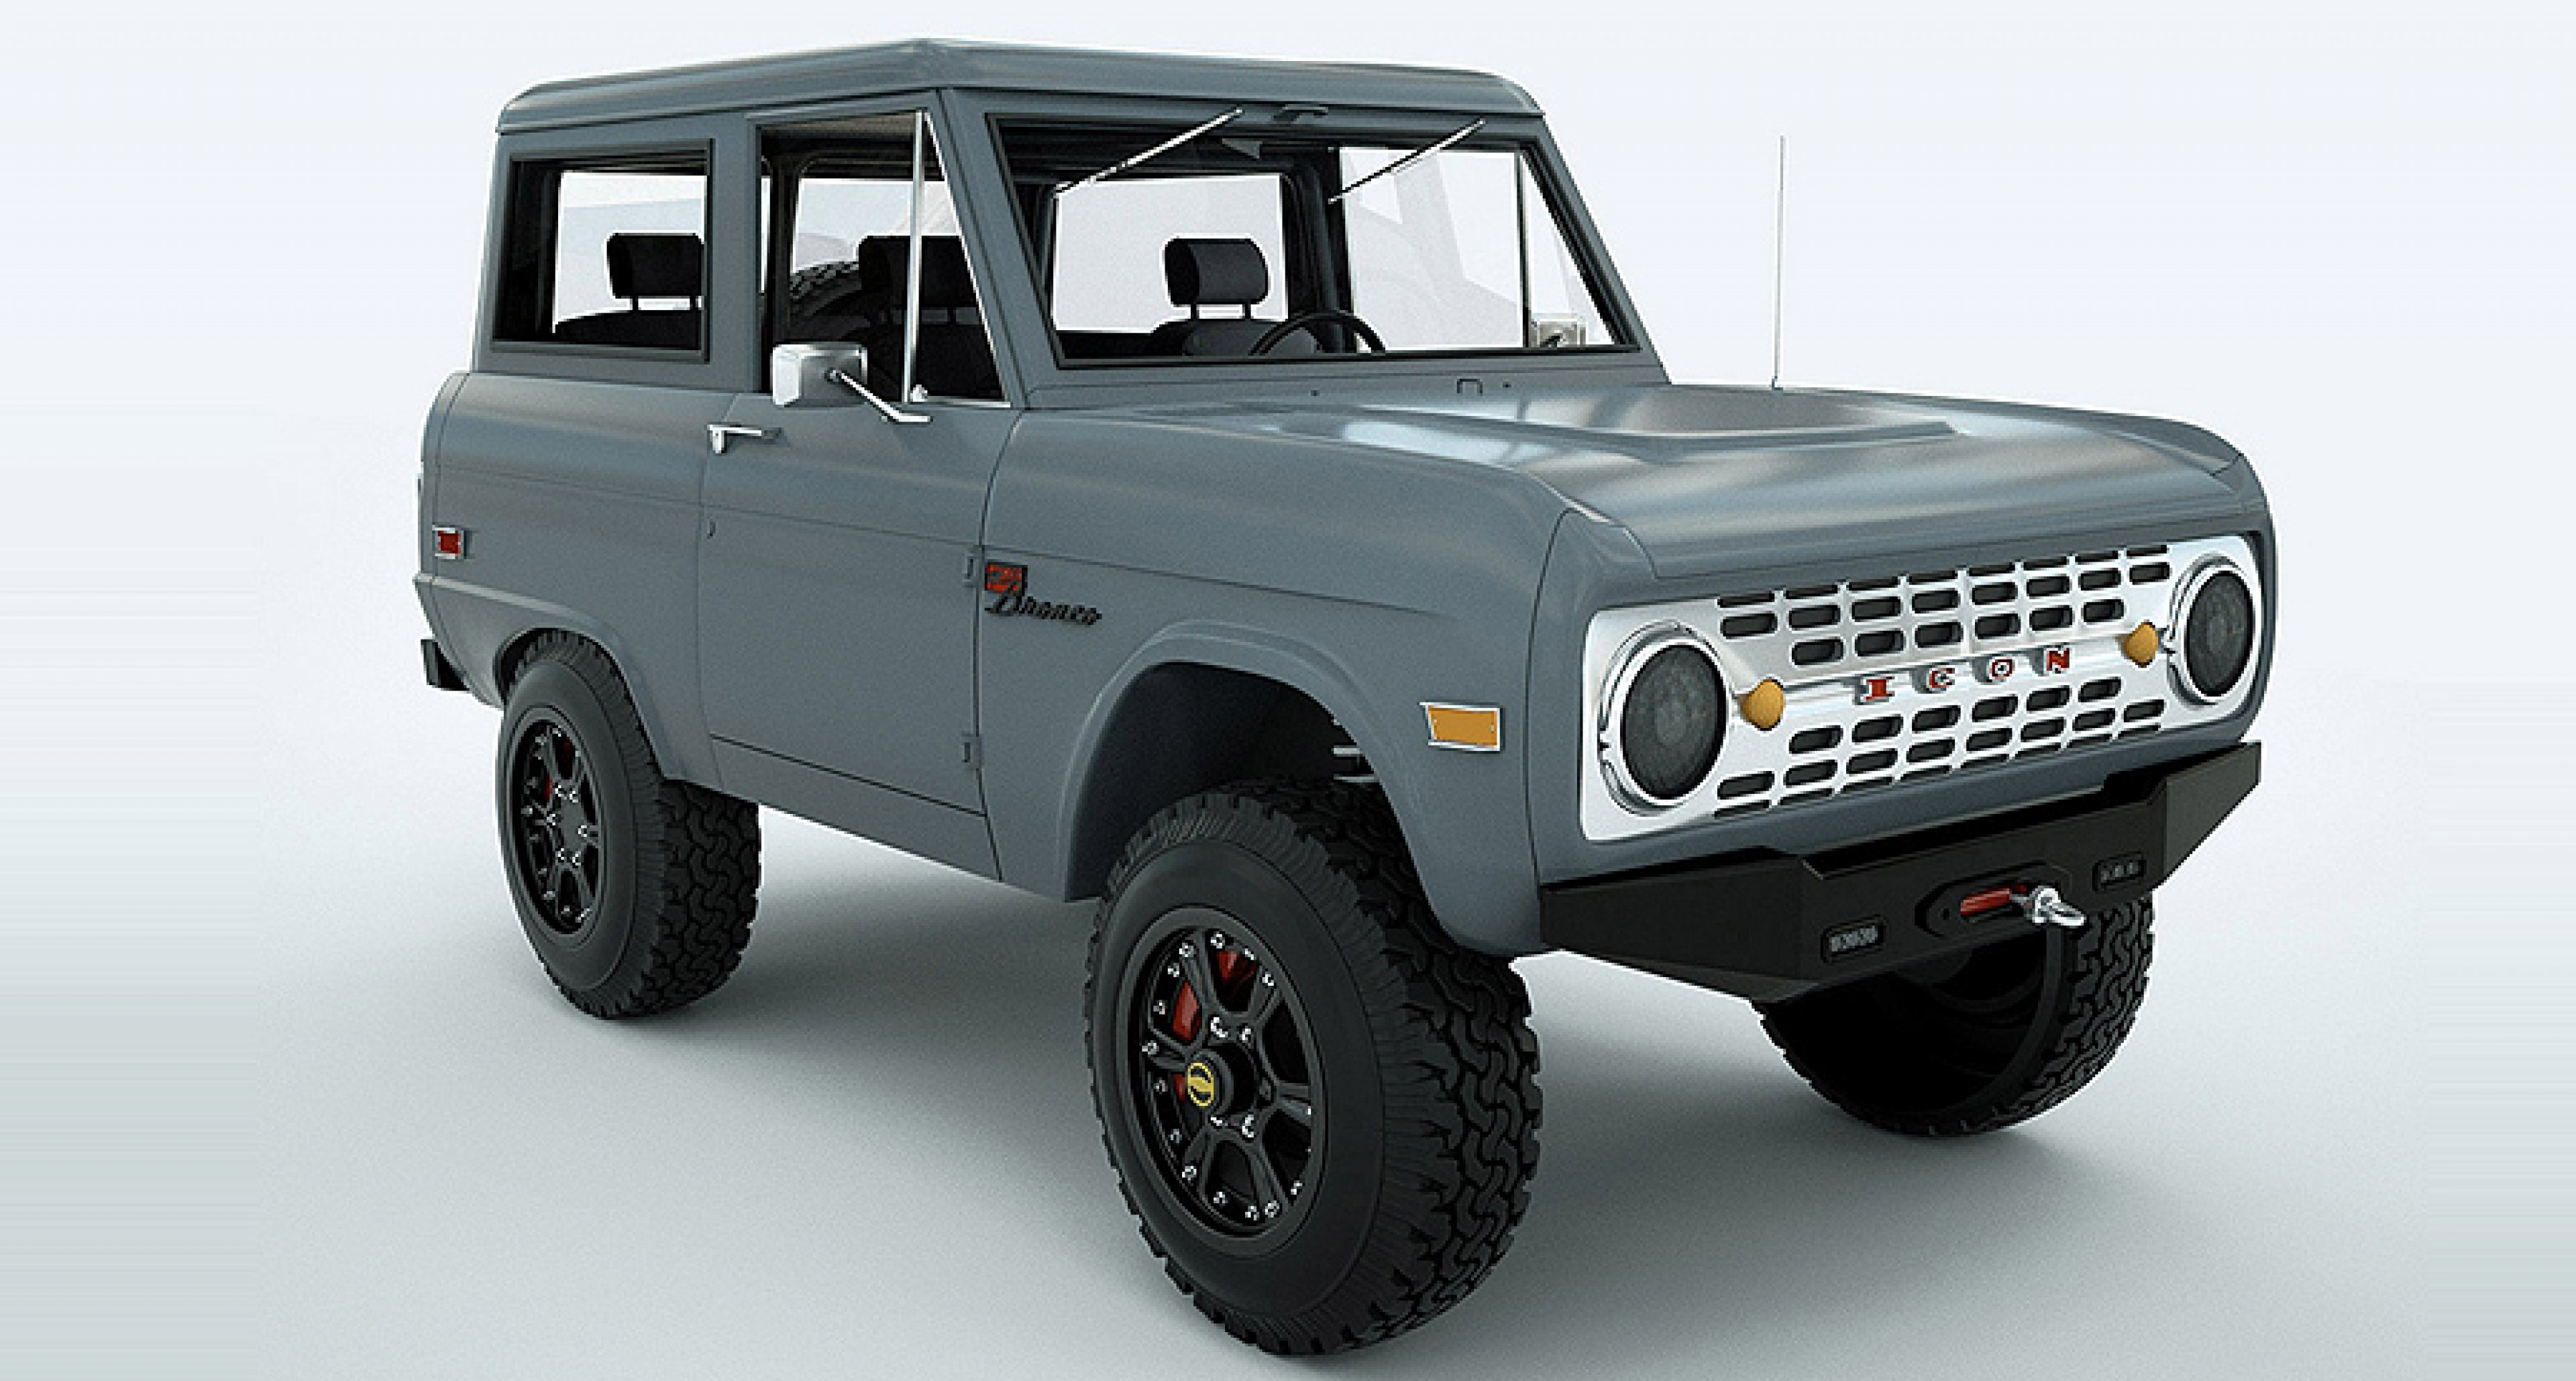 Icon Motors Bronco: An American legend resurrected